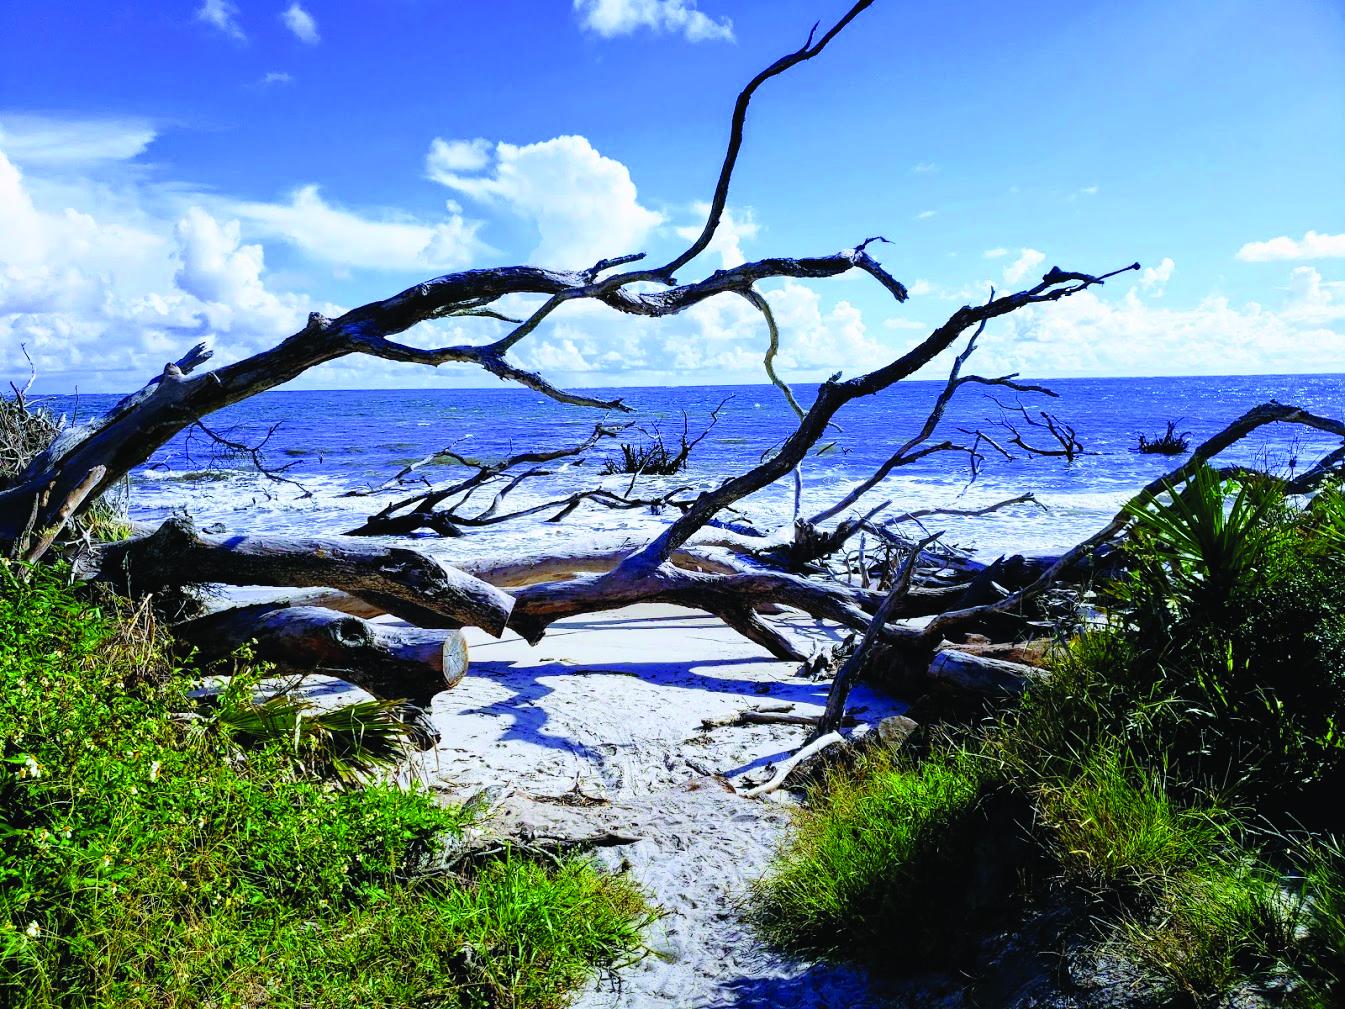 Amelia Island - Big Talbot Island